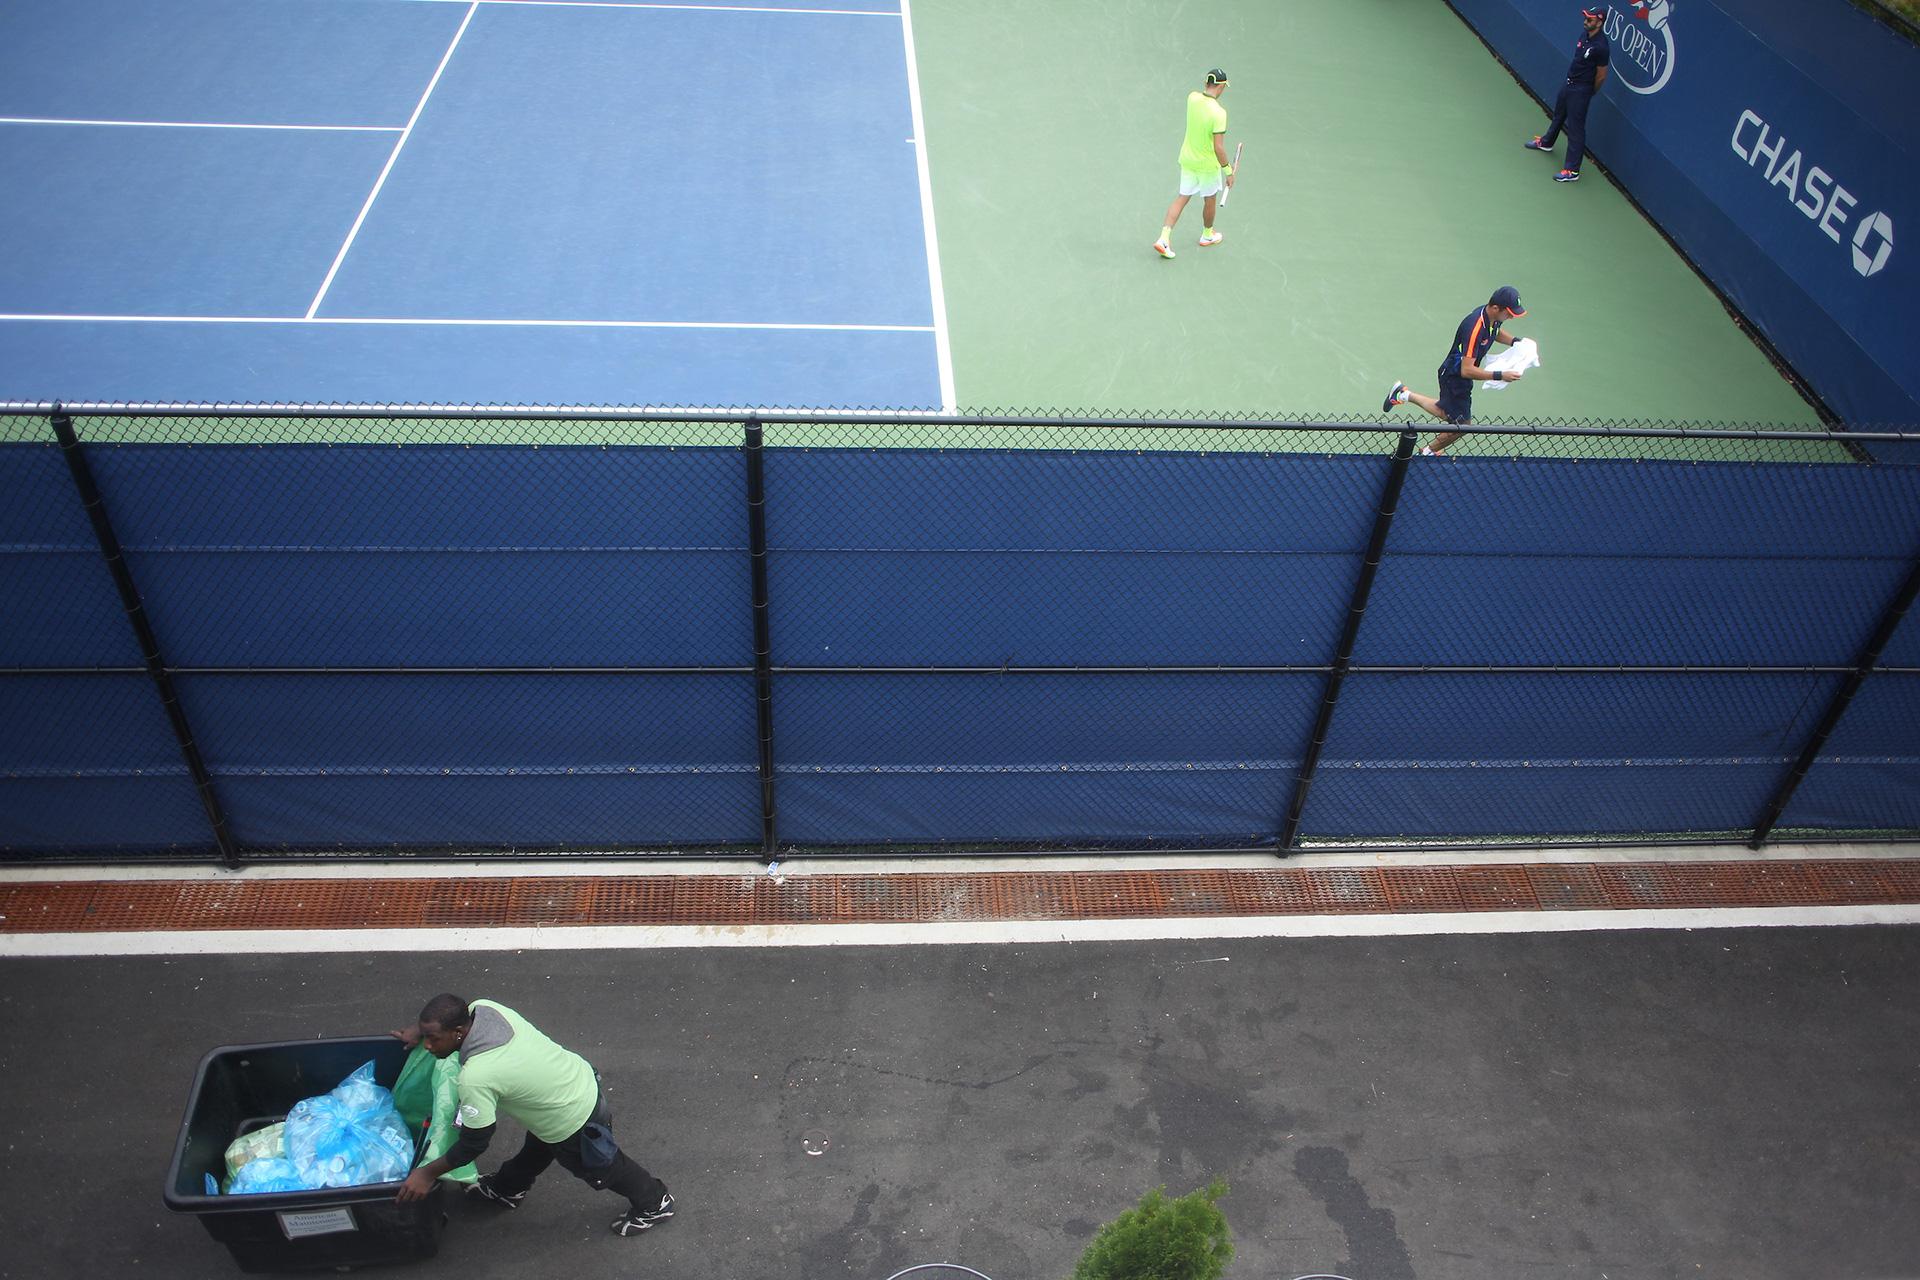 040916_Tennis_USOpen_4444